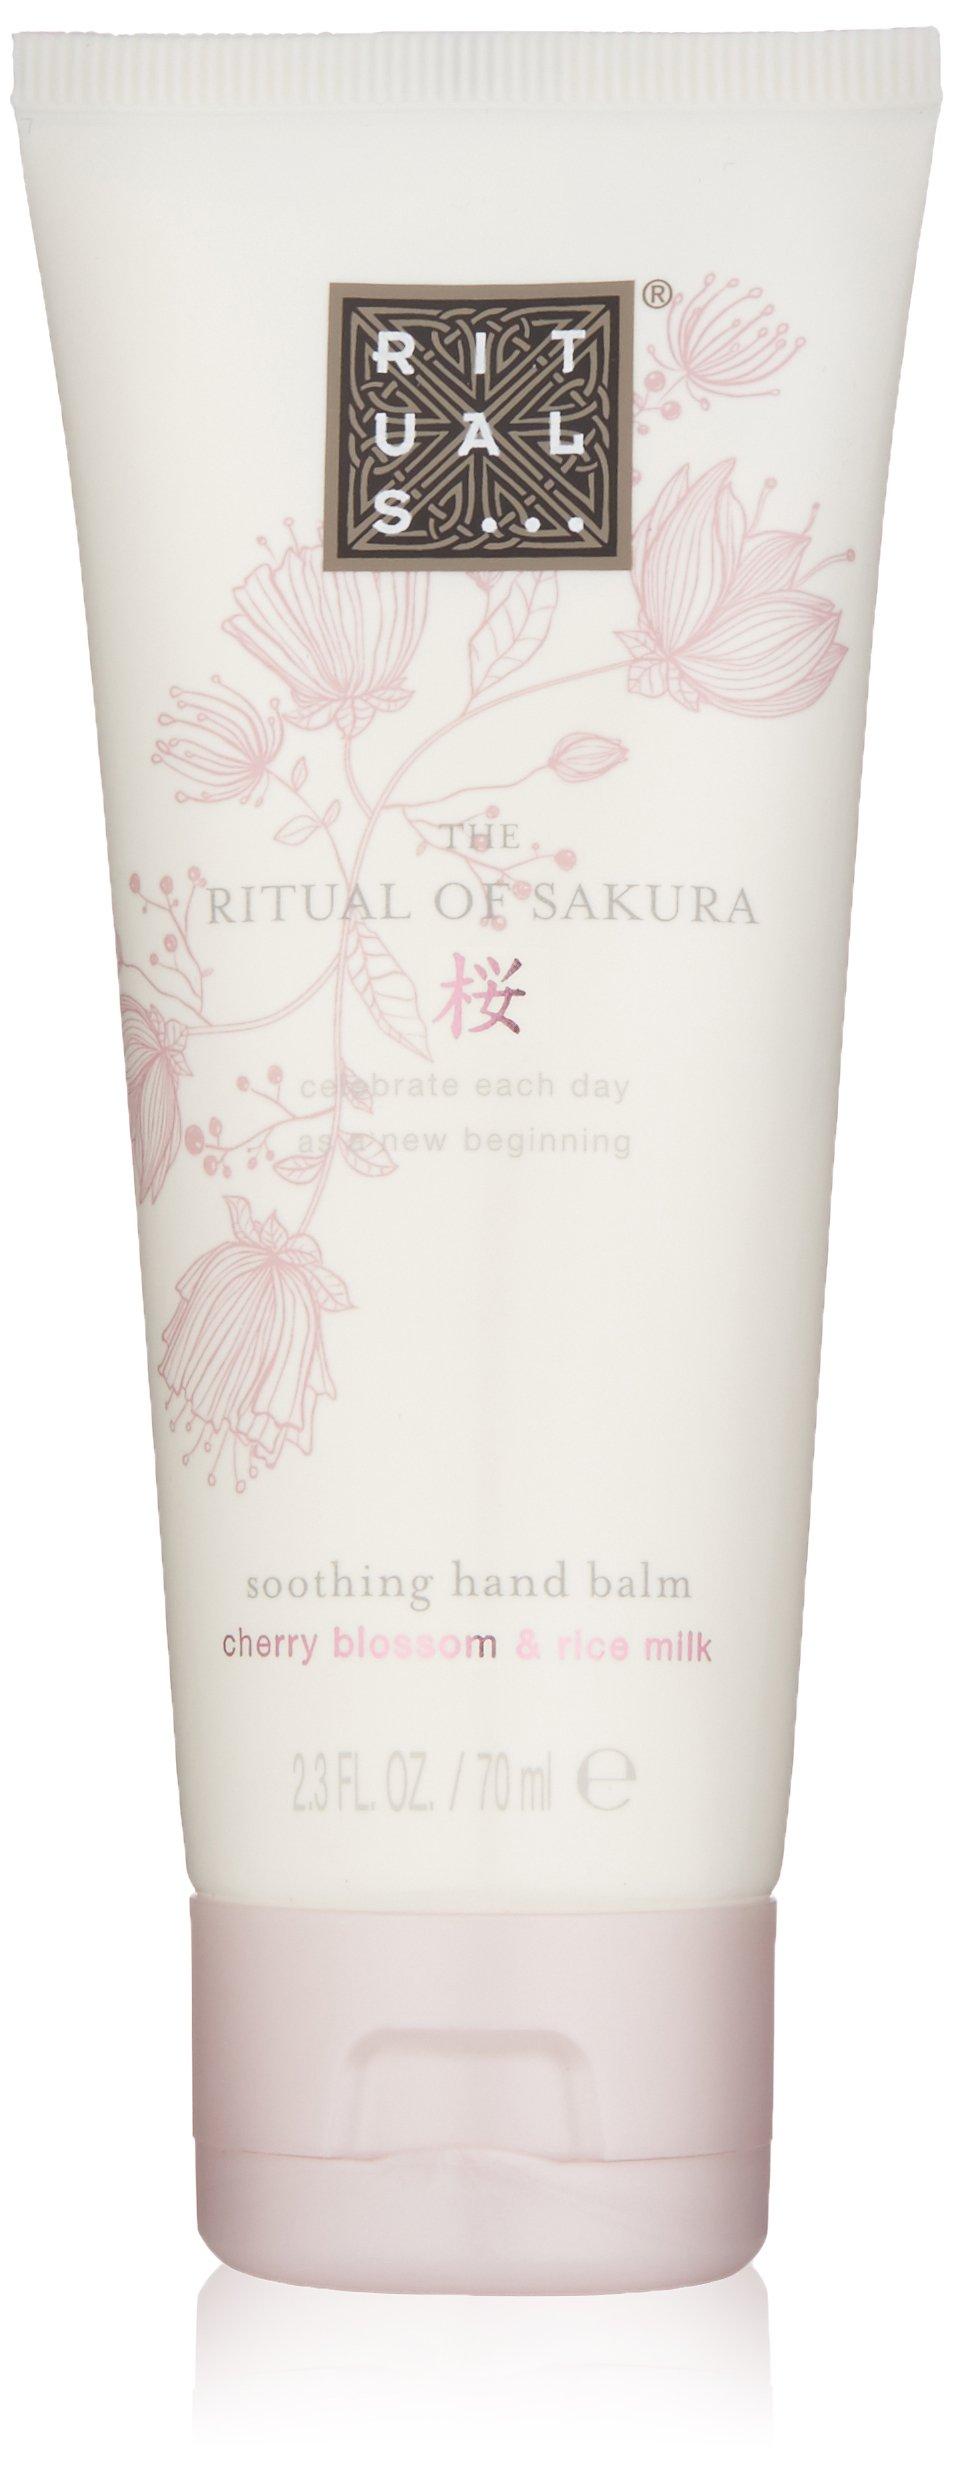 Rituals The Ritual of Sakura Pflegender Handbalsam, 70 ml product image